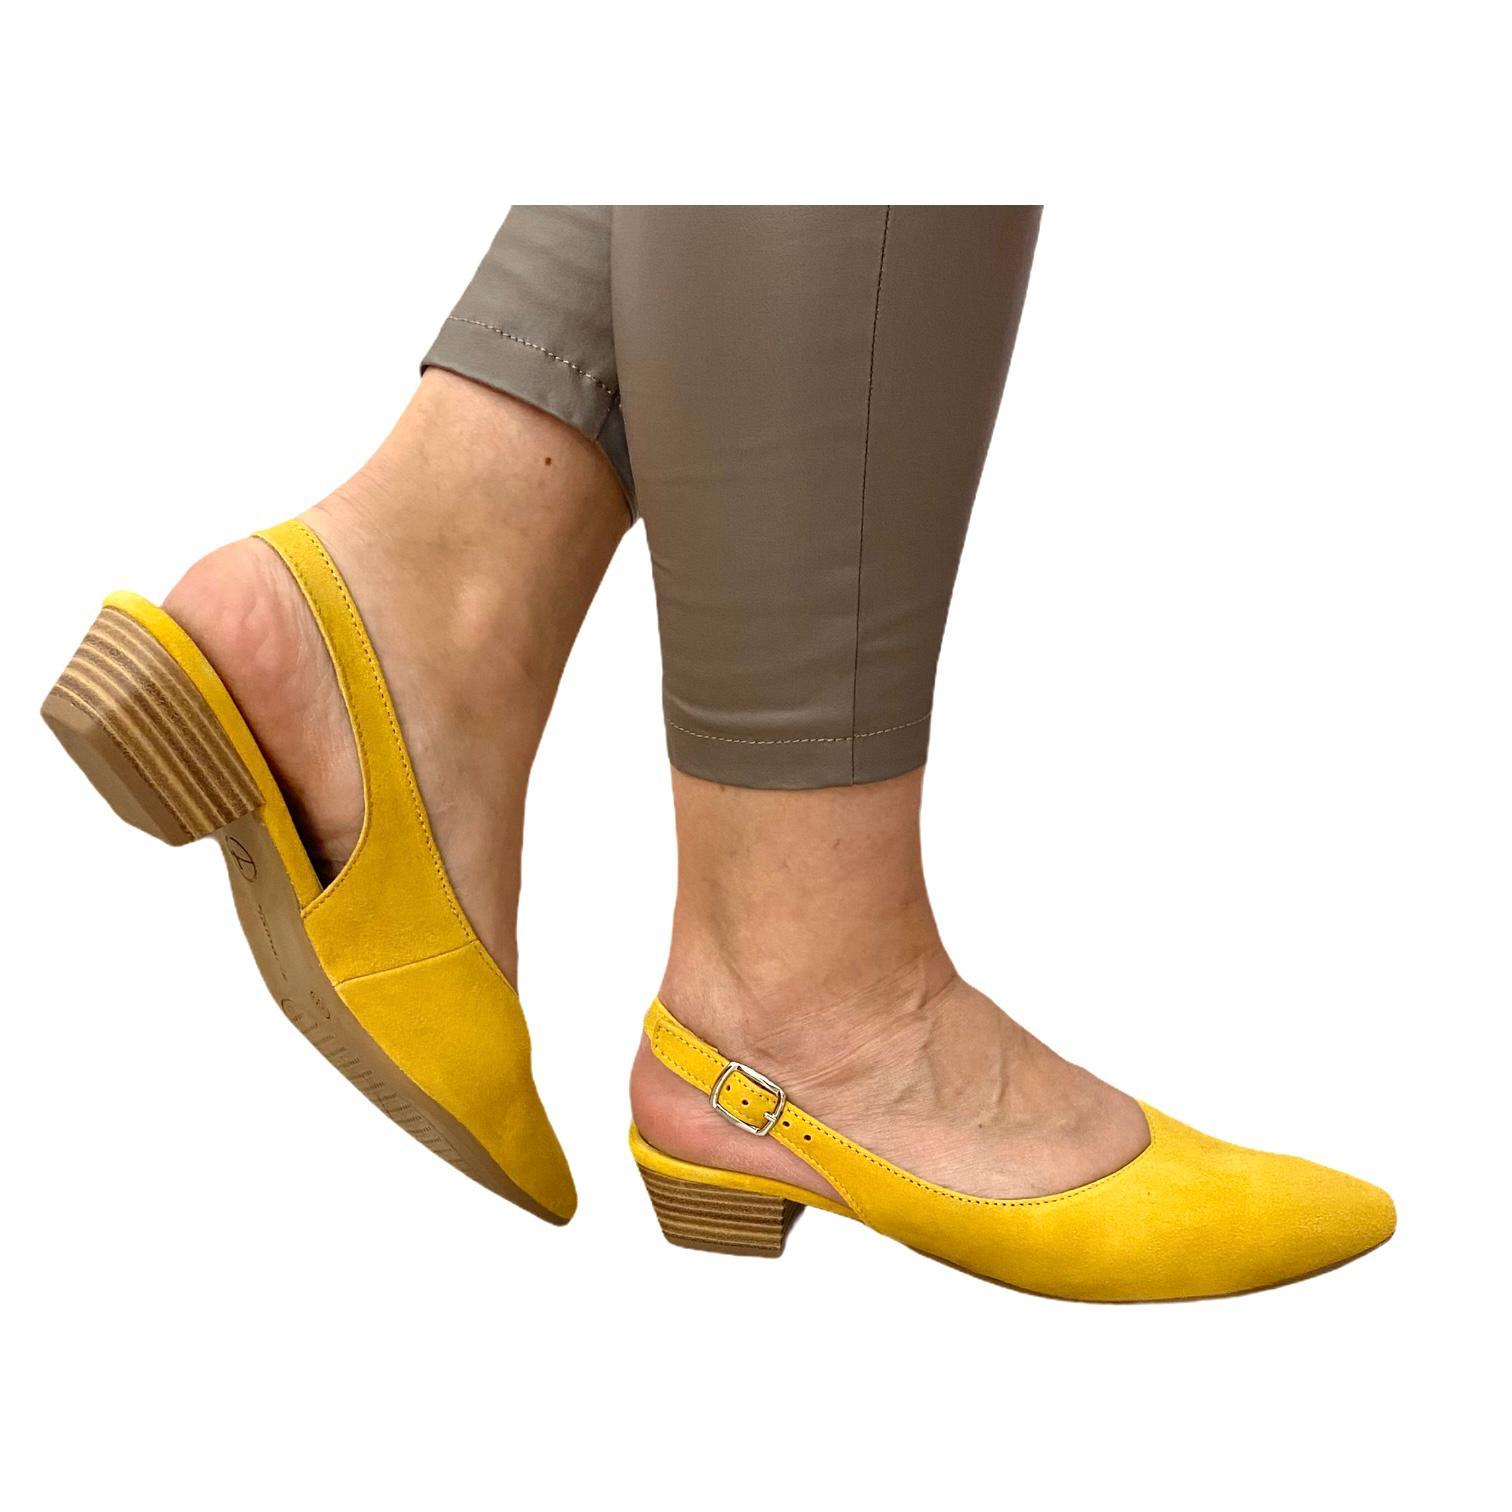 Pantofi Tamaris galbeni cu toc decupati in spate